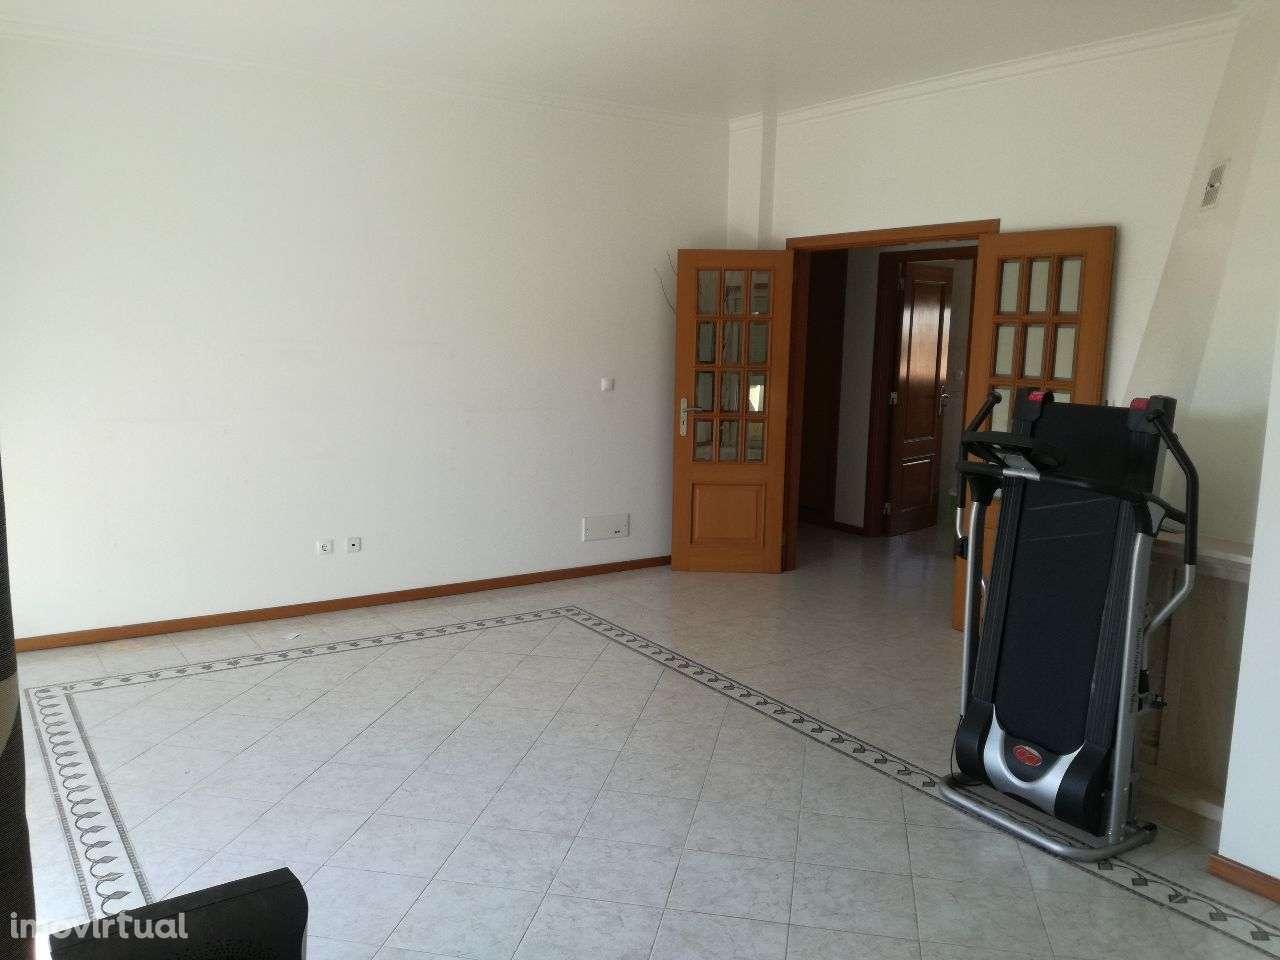 Apartamento para comprar, Santa Clara, Lisboa - Foto 4